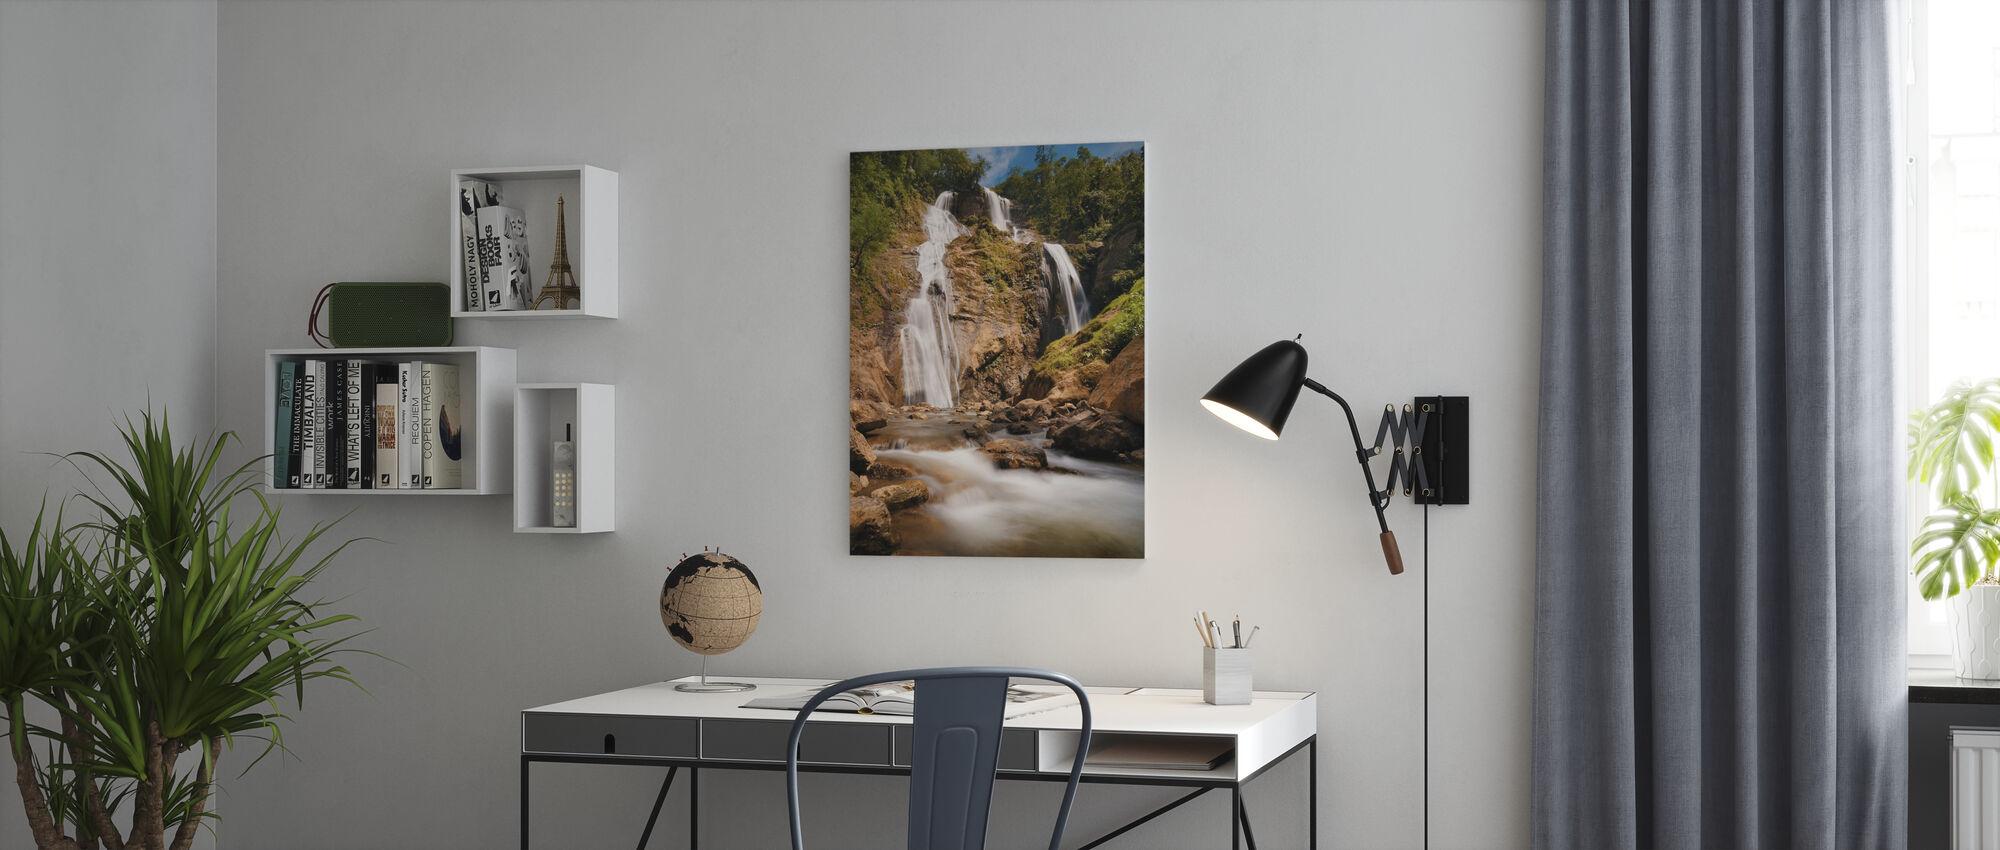 Bani Falls - Canvastavla - Kontor